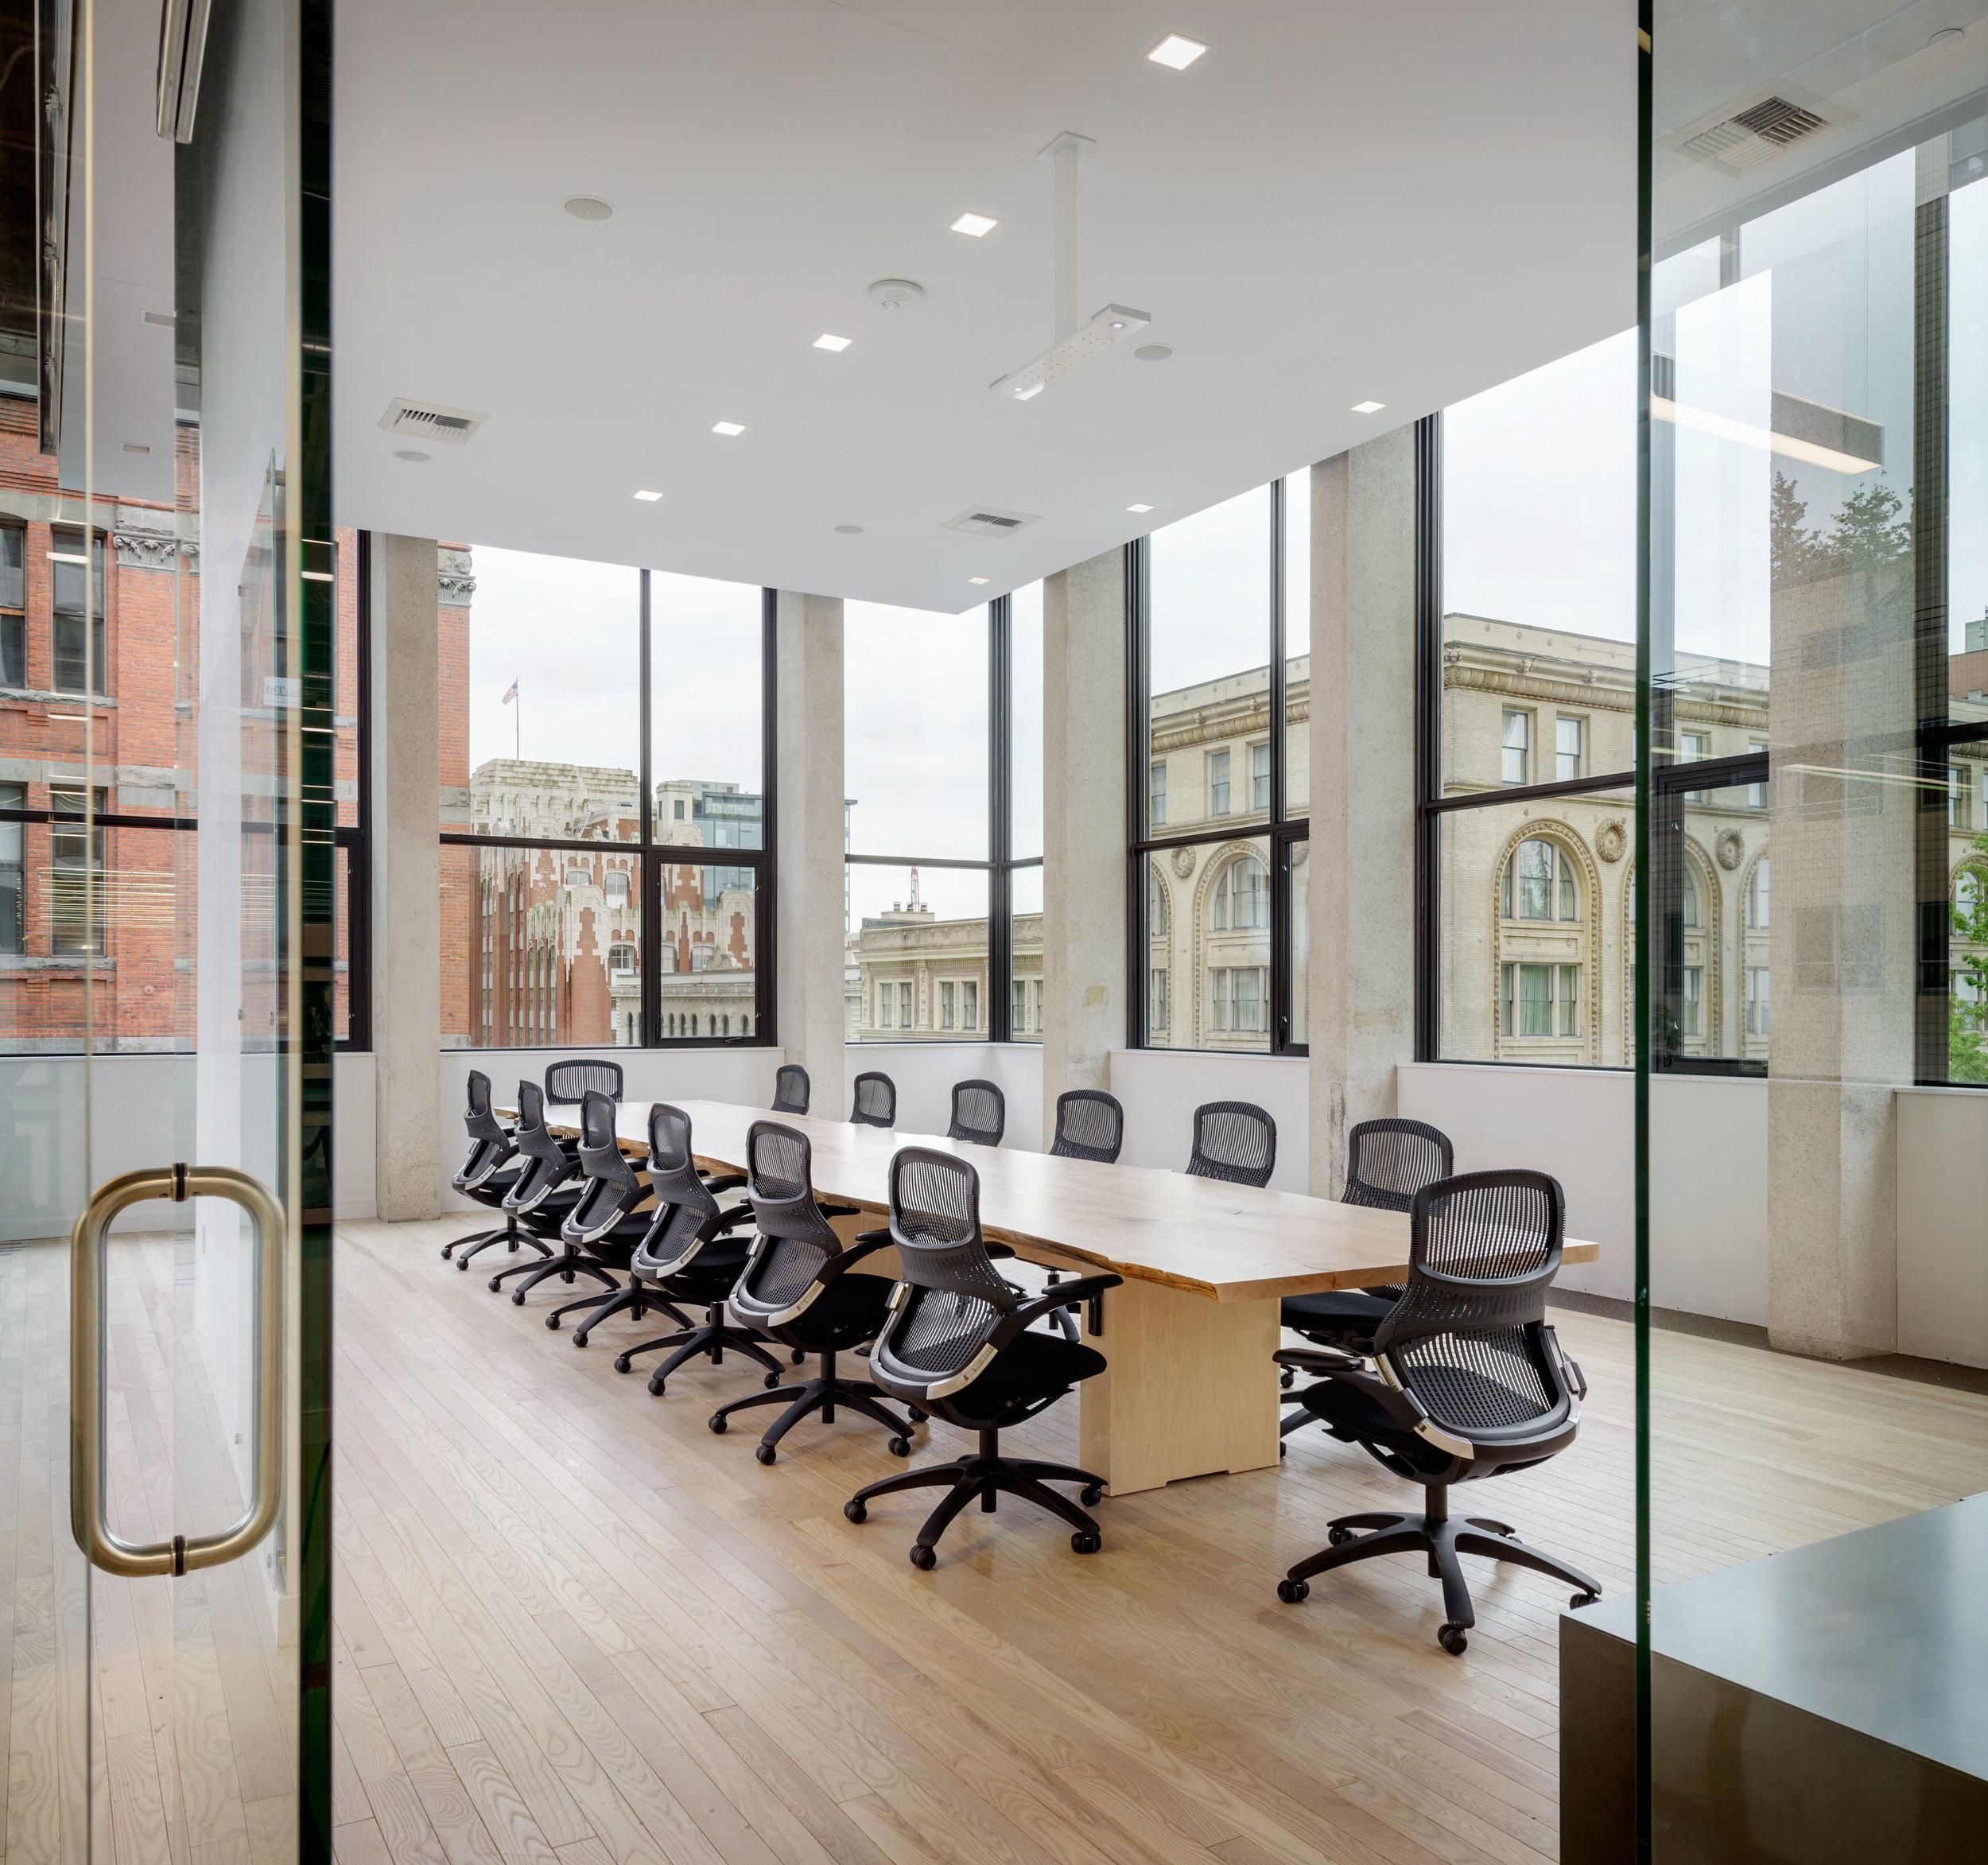 mg2-sea-office-173x.jpg